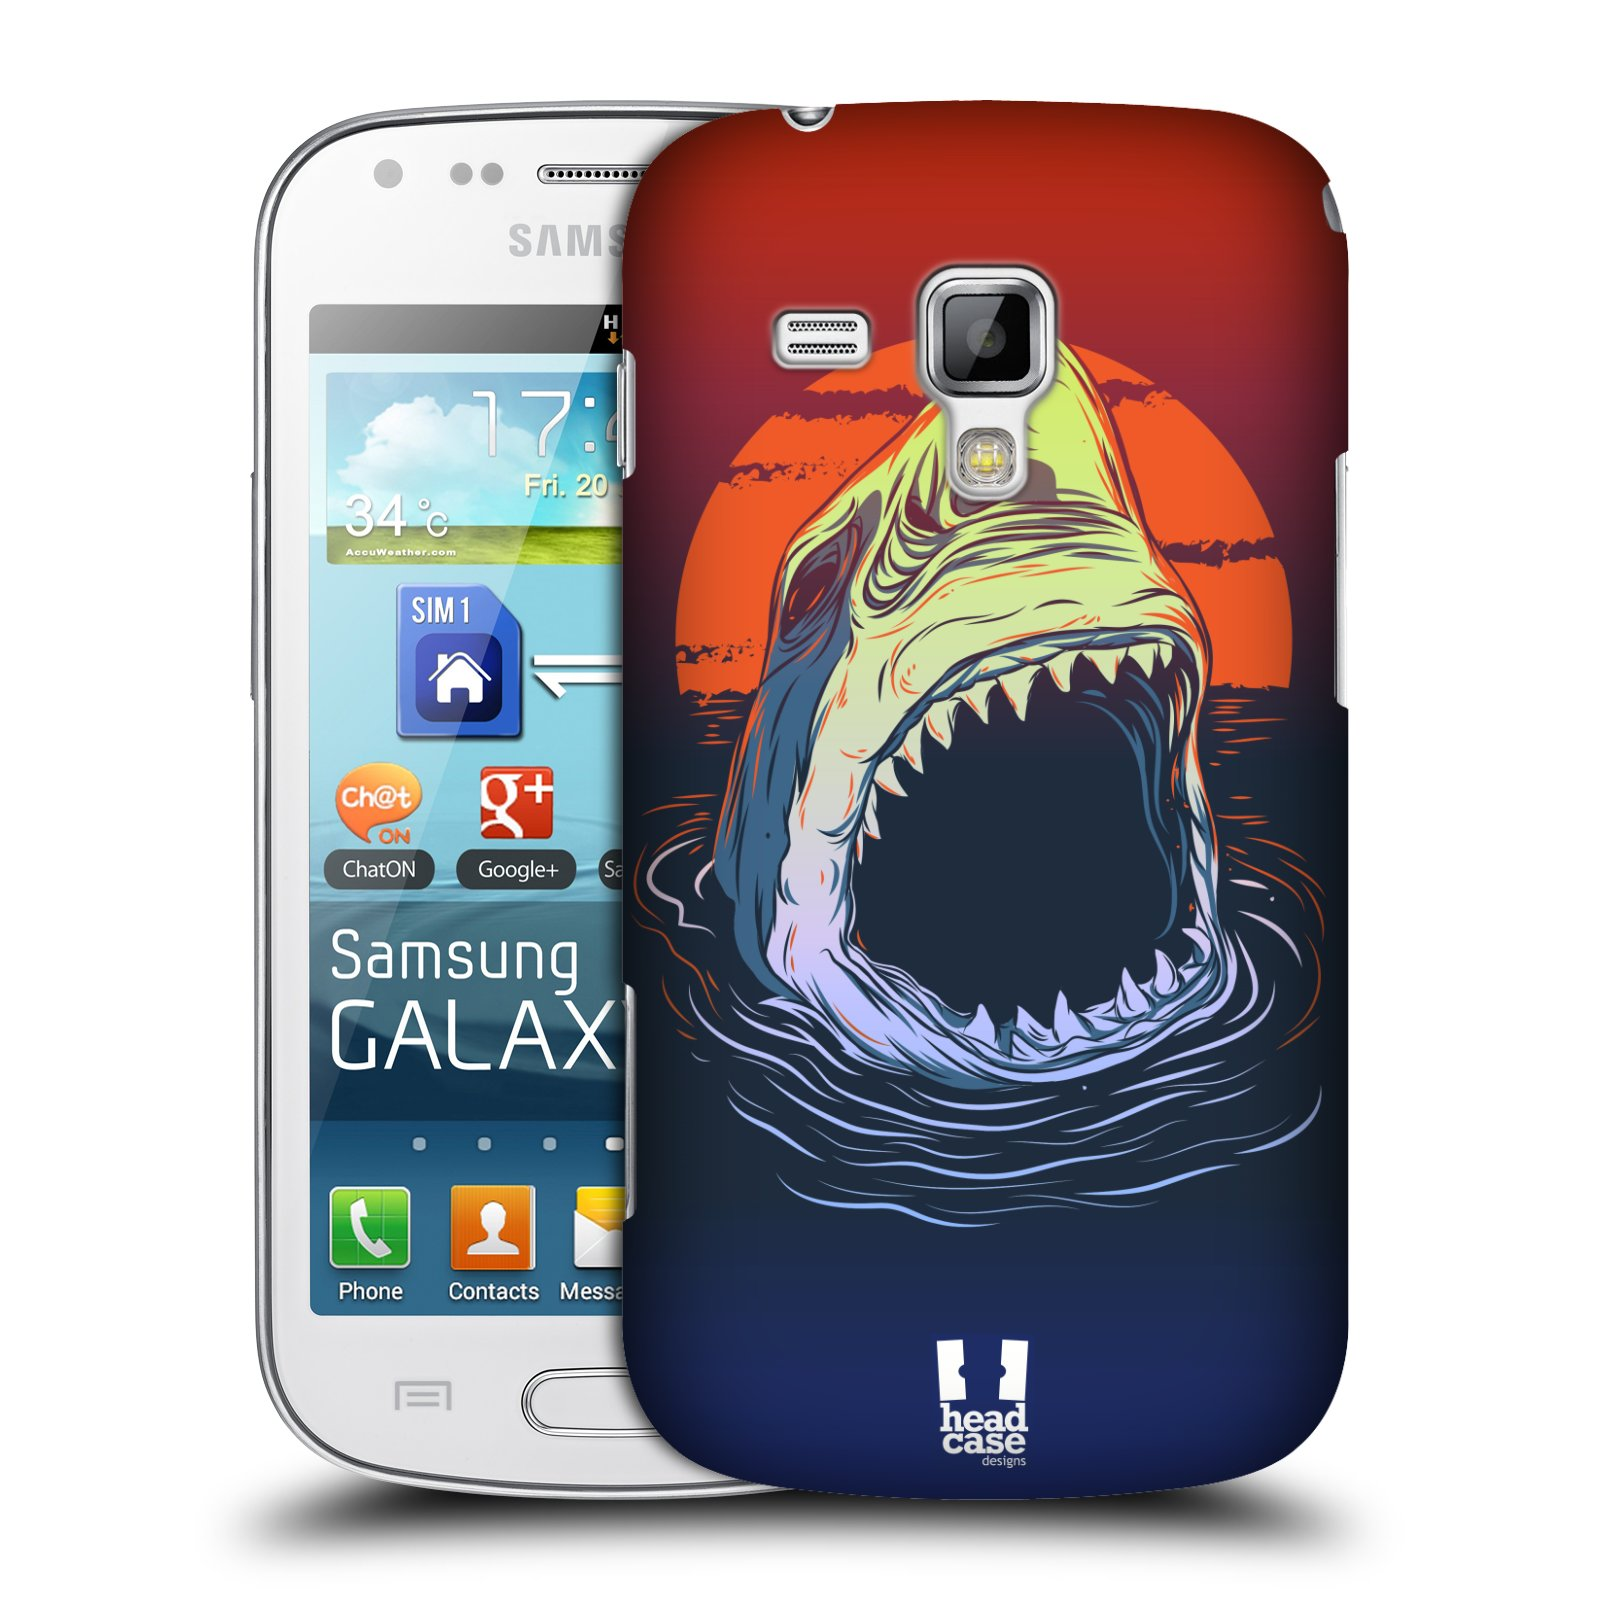 Plastové pouzdro na mobil Samsung Galaxy Trend HEAD CASE HLADOVÝ ŽRALOK (Kryt či obal na mobilní telefon Samsung Galaxy Trend GT-S7560)